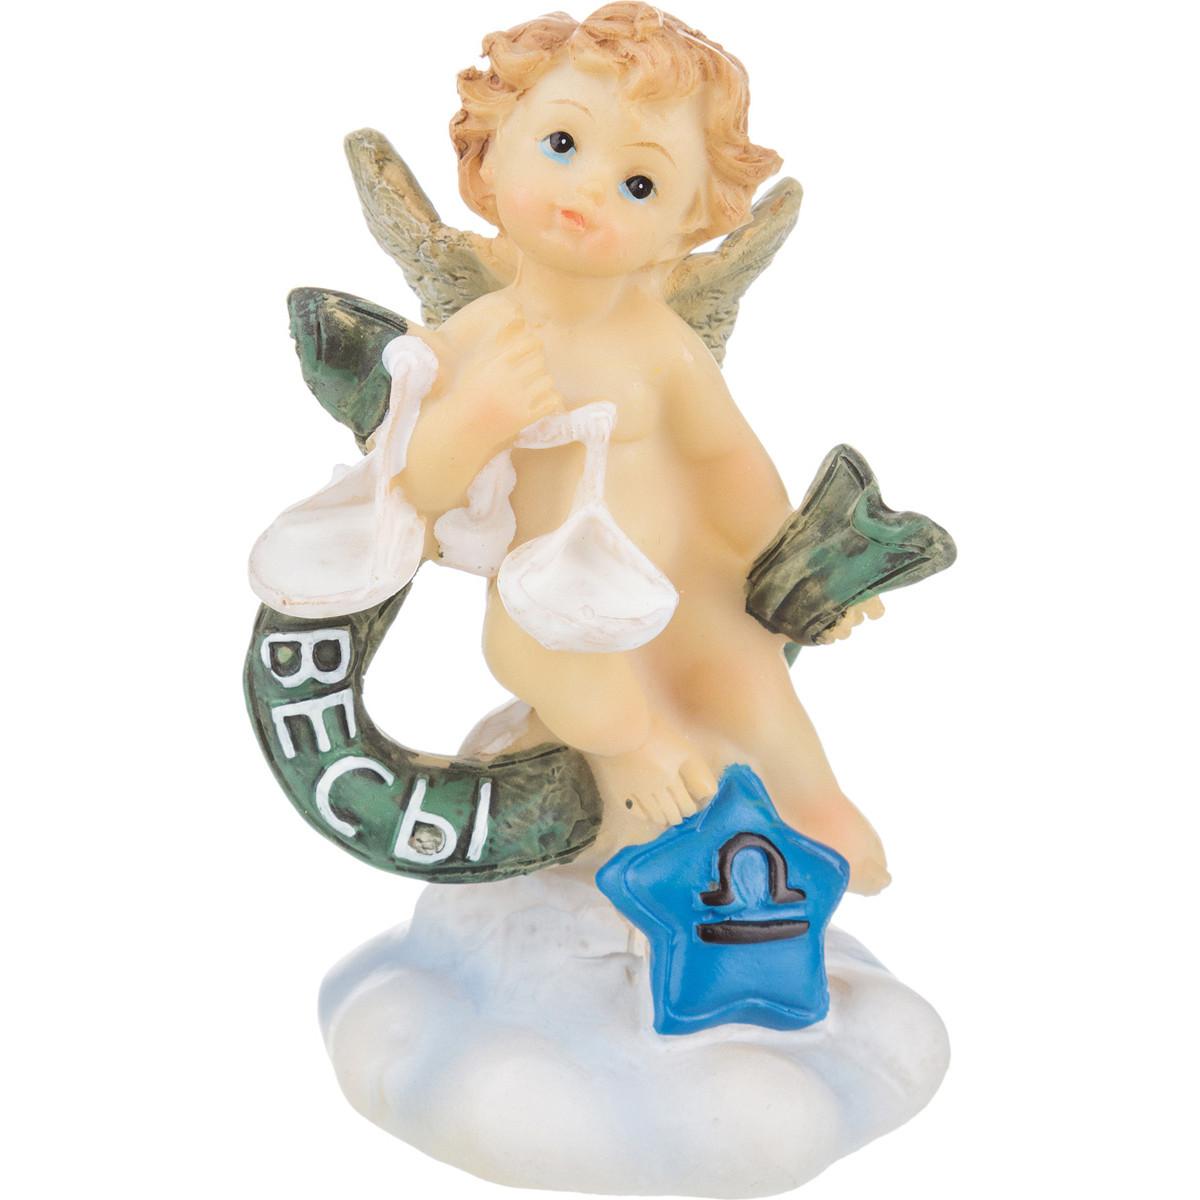 Купить Статуэтки и фигурки Lefard, Фигурка Donough (4х4х7 см), Китай, Бежевый, Зеленый, Полистоун